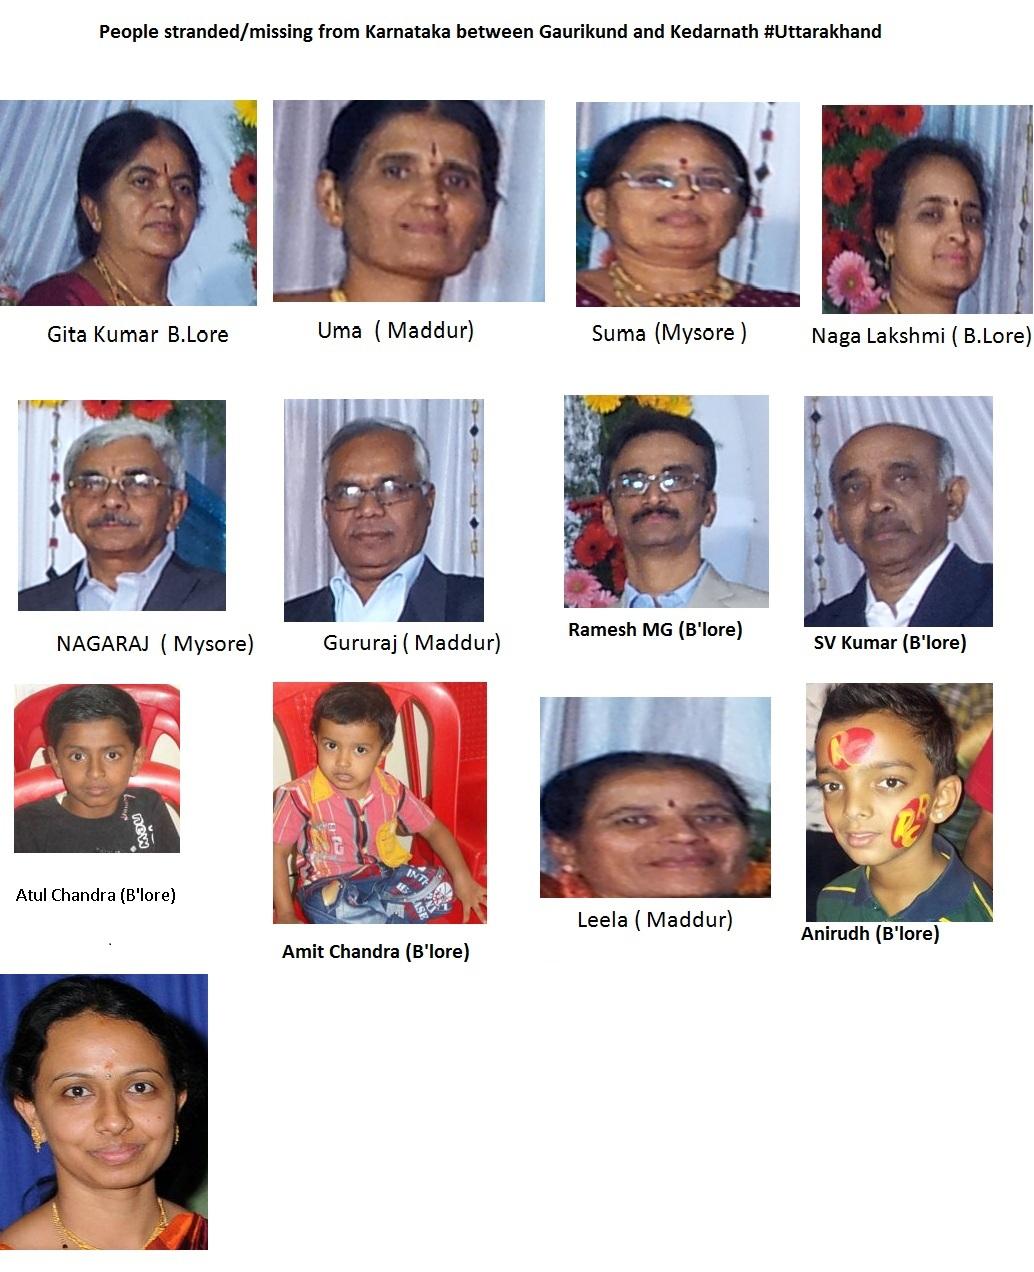 Needs Emergency Help: 13 People of a Family from Karnataka Missing in Uttarakhand